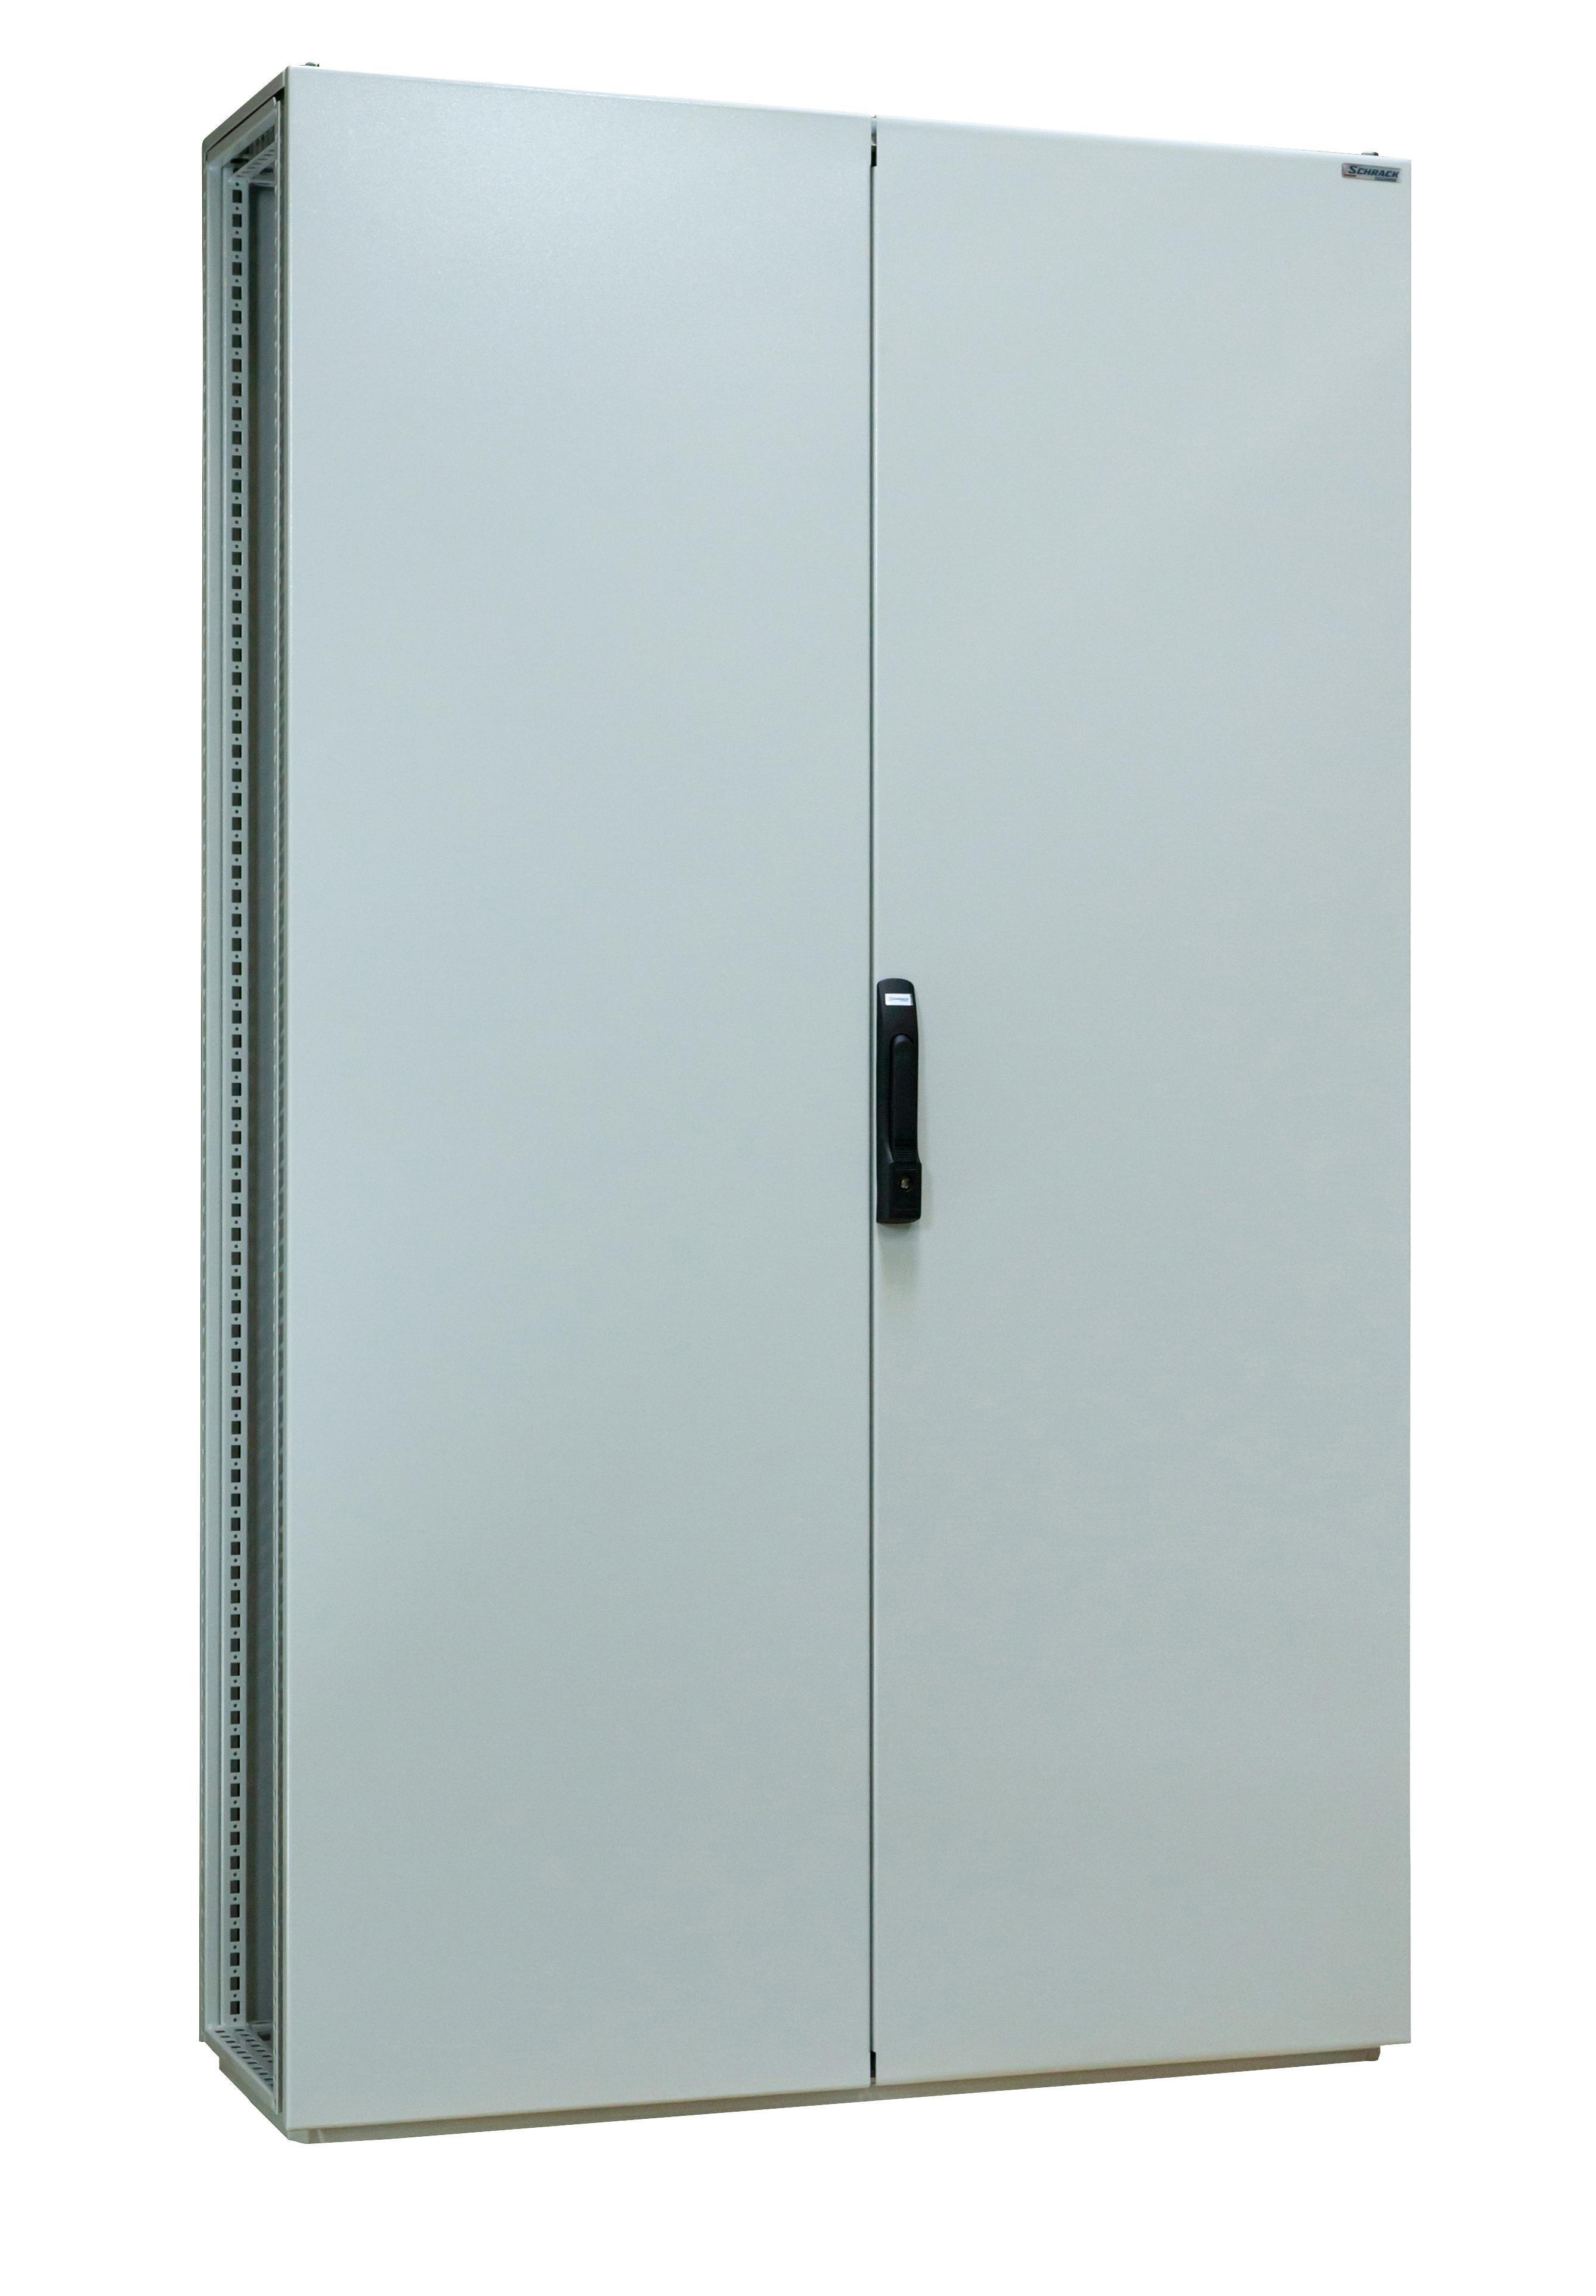 1 Stk Anreihschrank 2-türig, 1800x1000x400mm, RAL 7035 AS181042-5